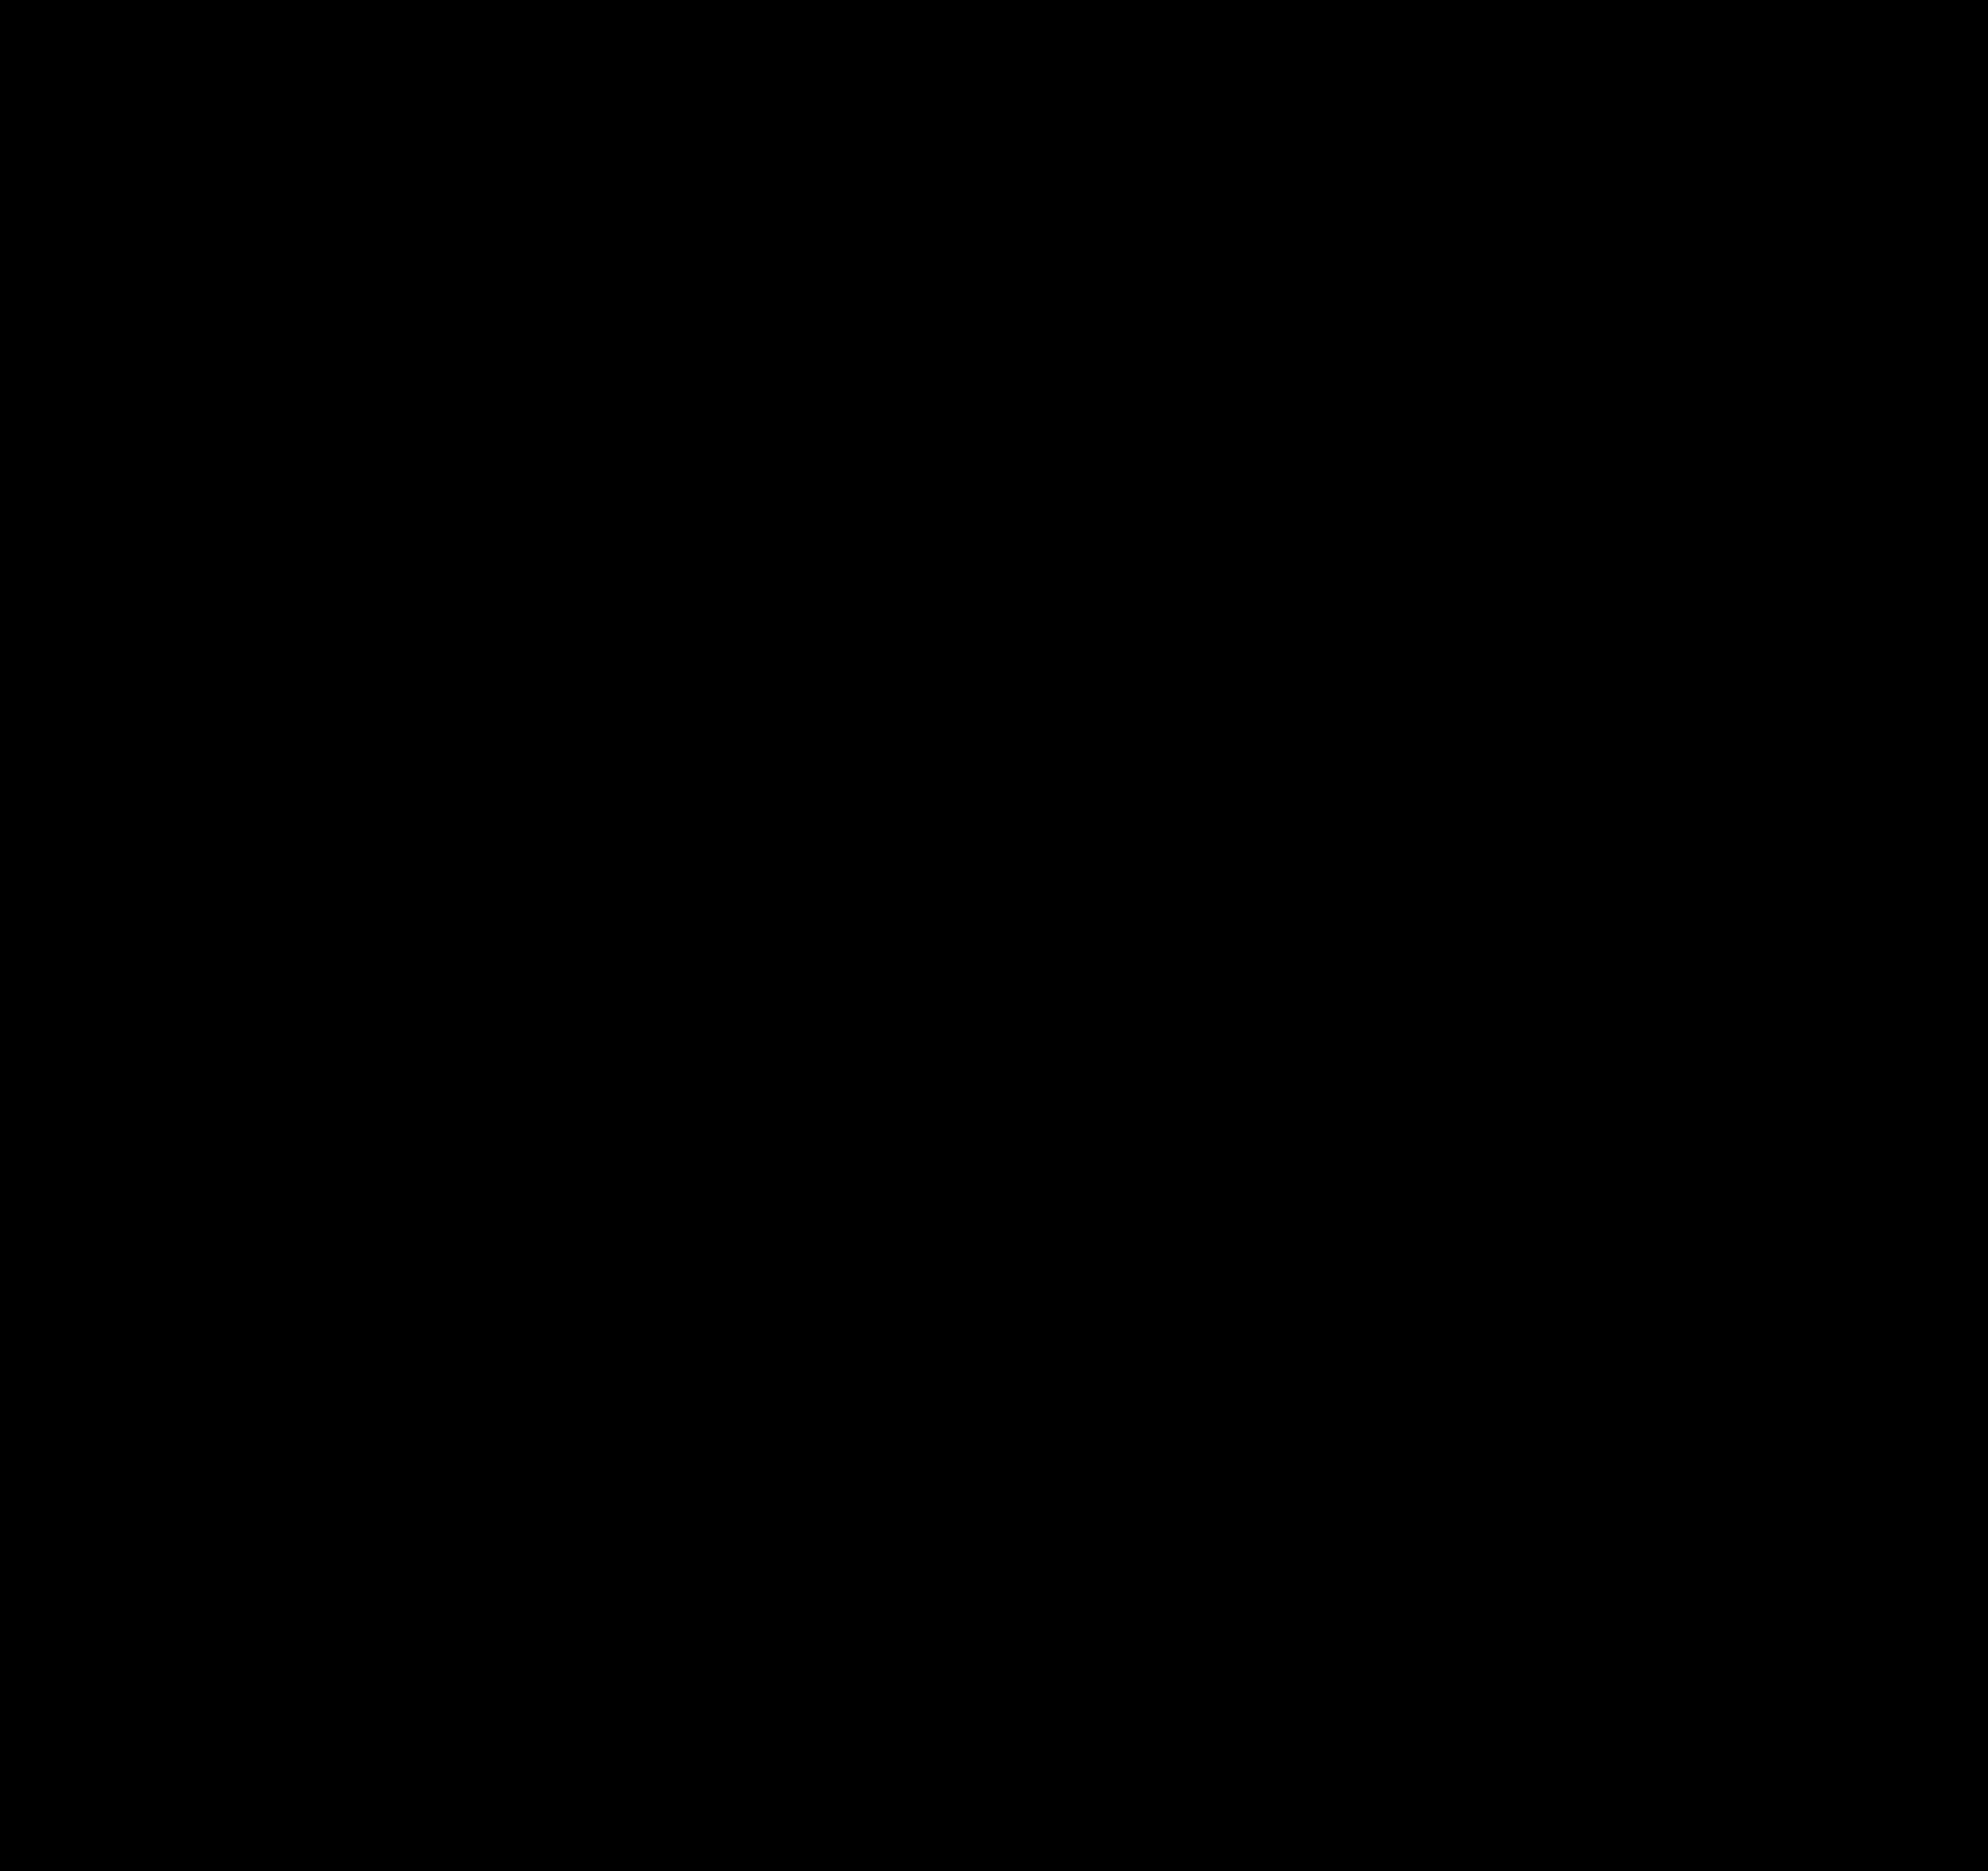 picture black and white File noun project wikimedia. Hammer svg